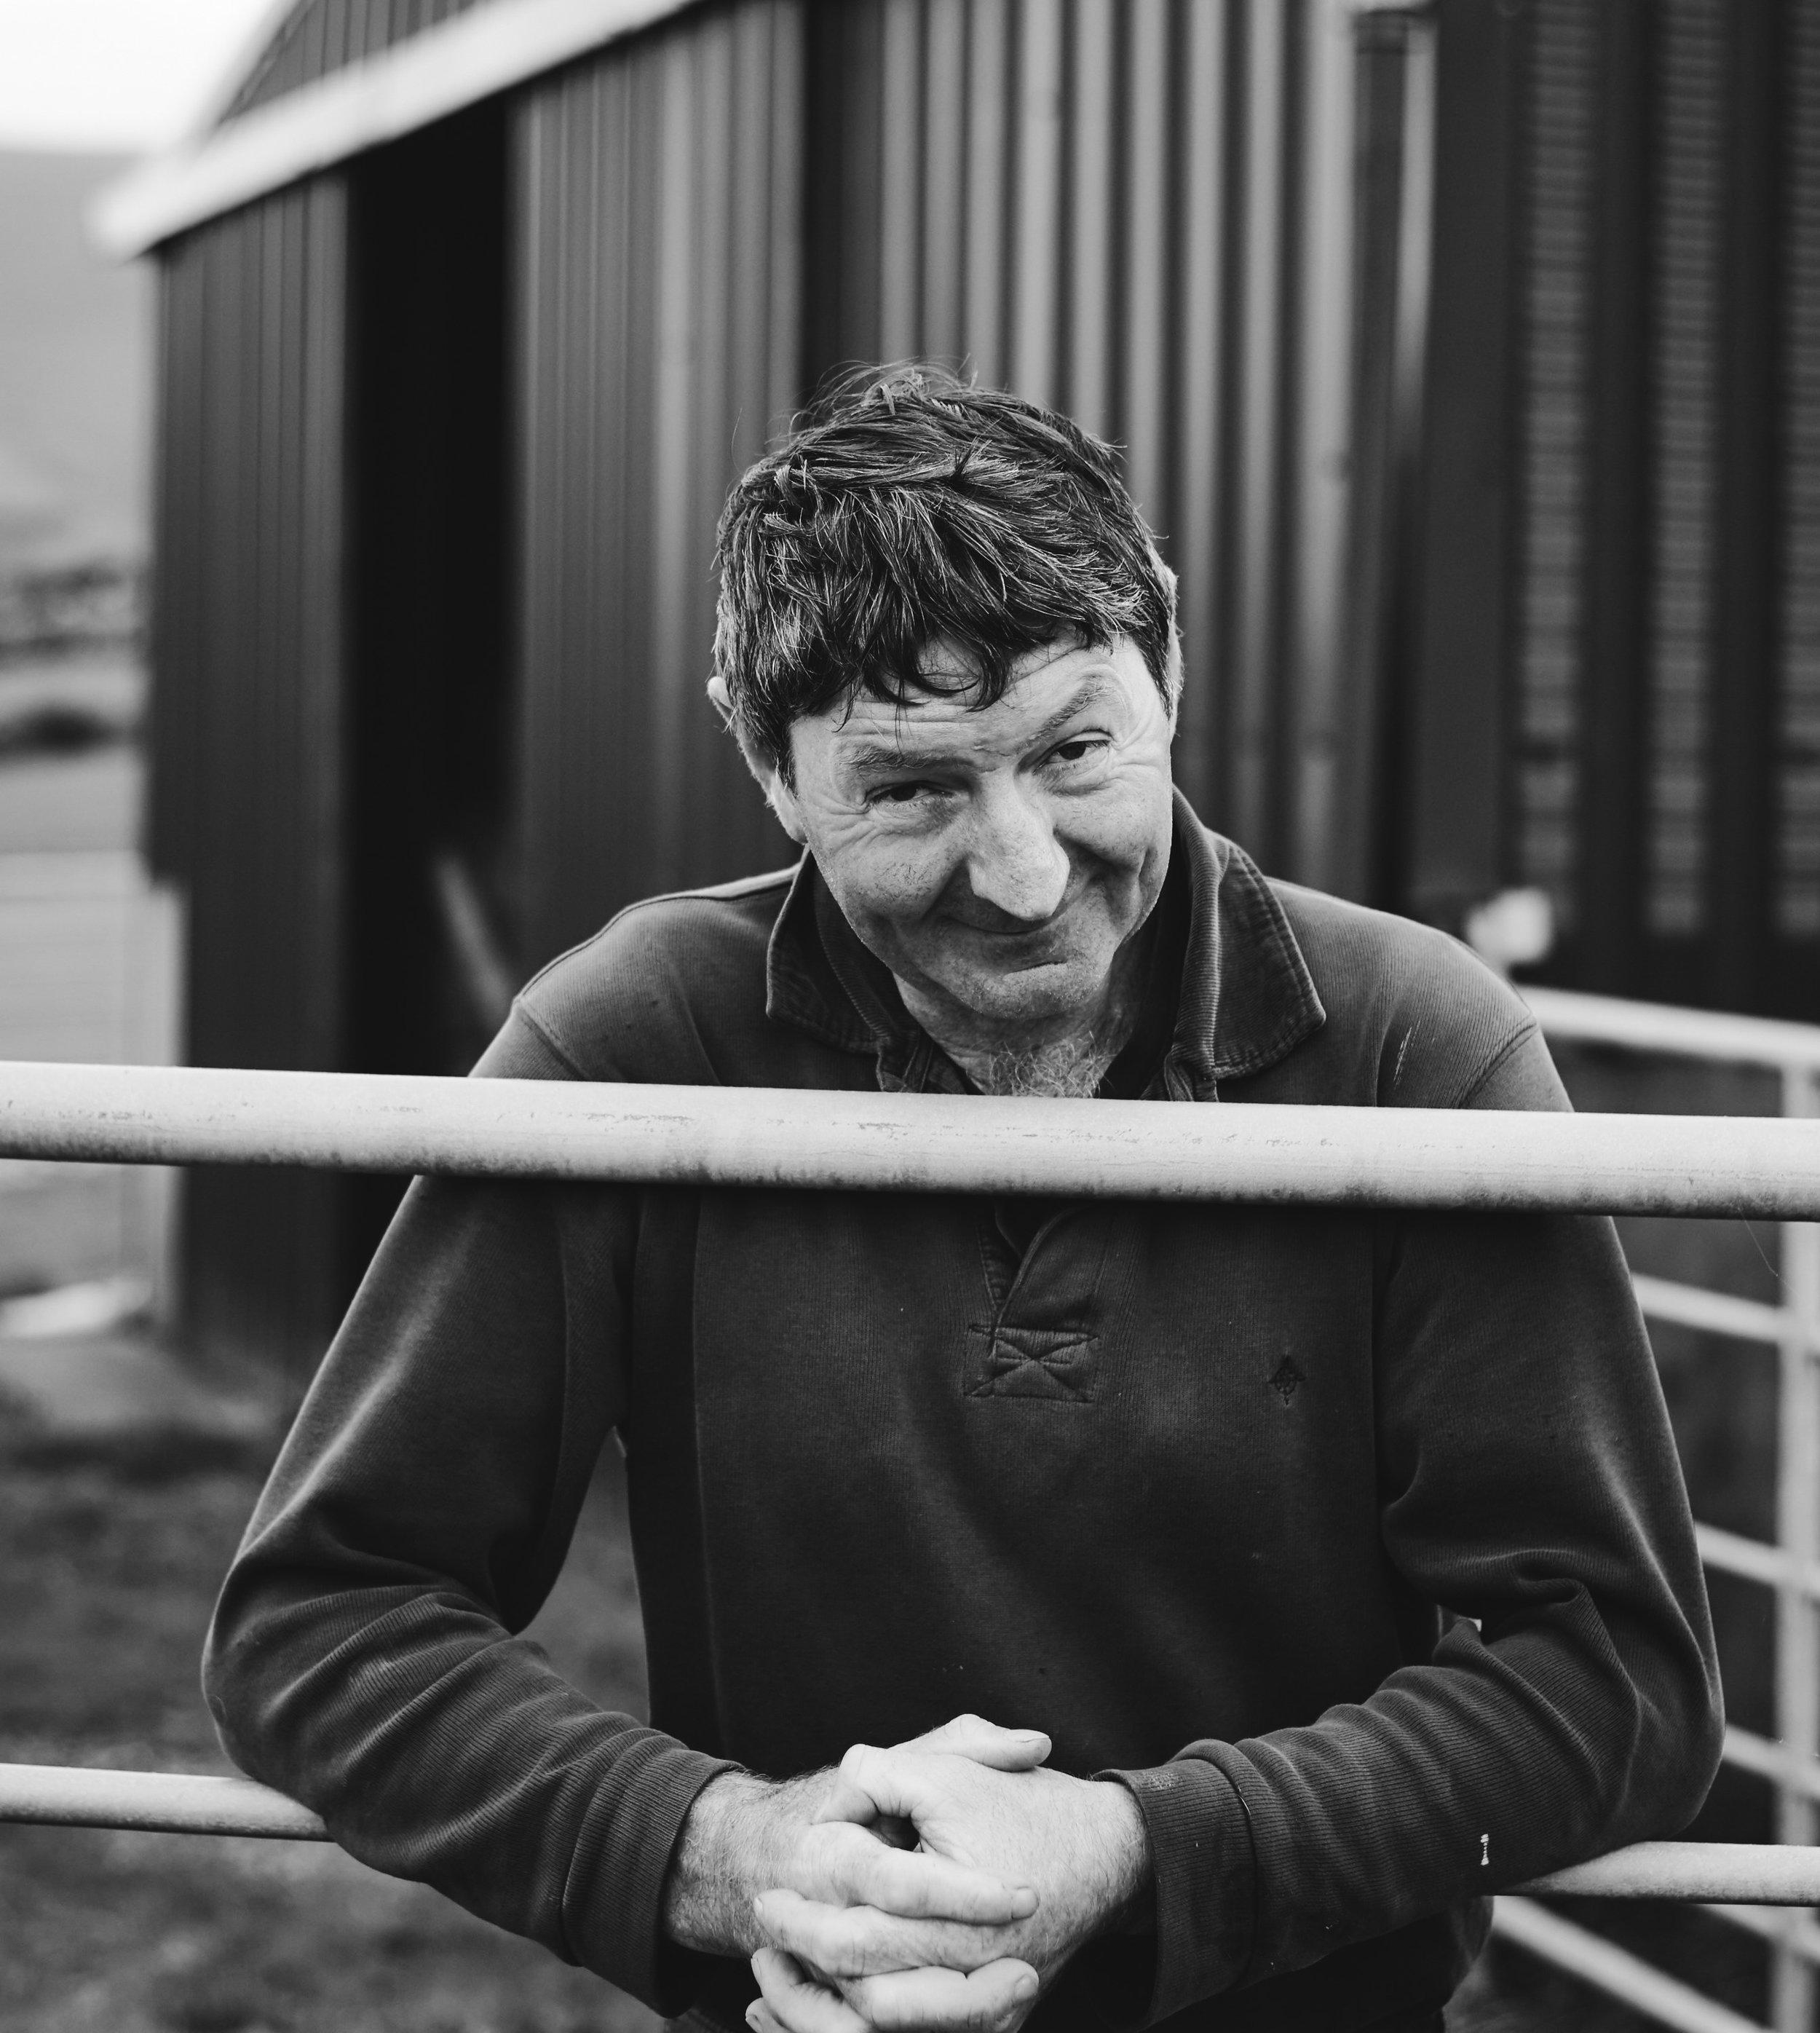 Irish Sheep Farmer Toronto Lifestyle photographer